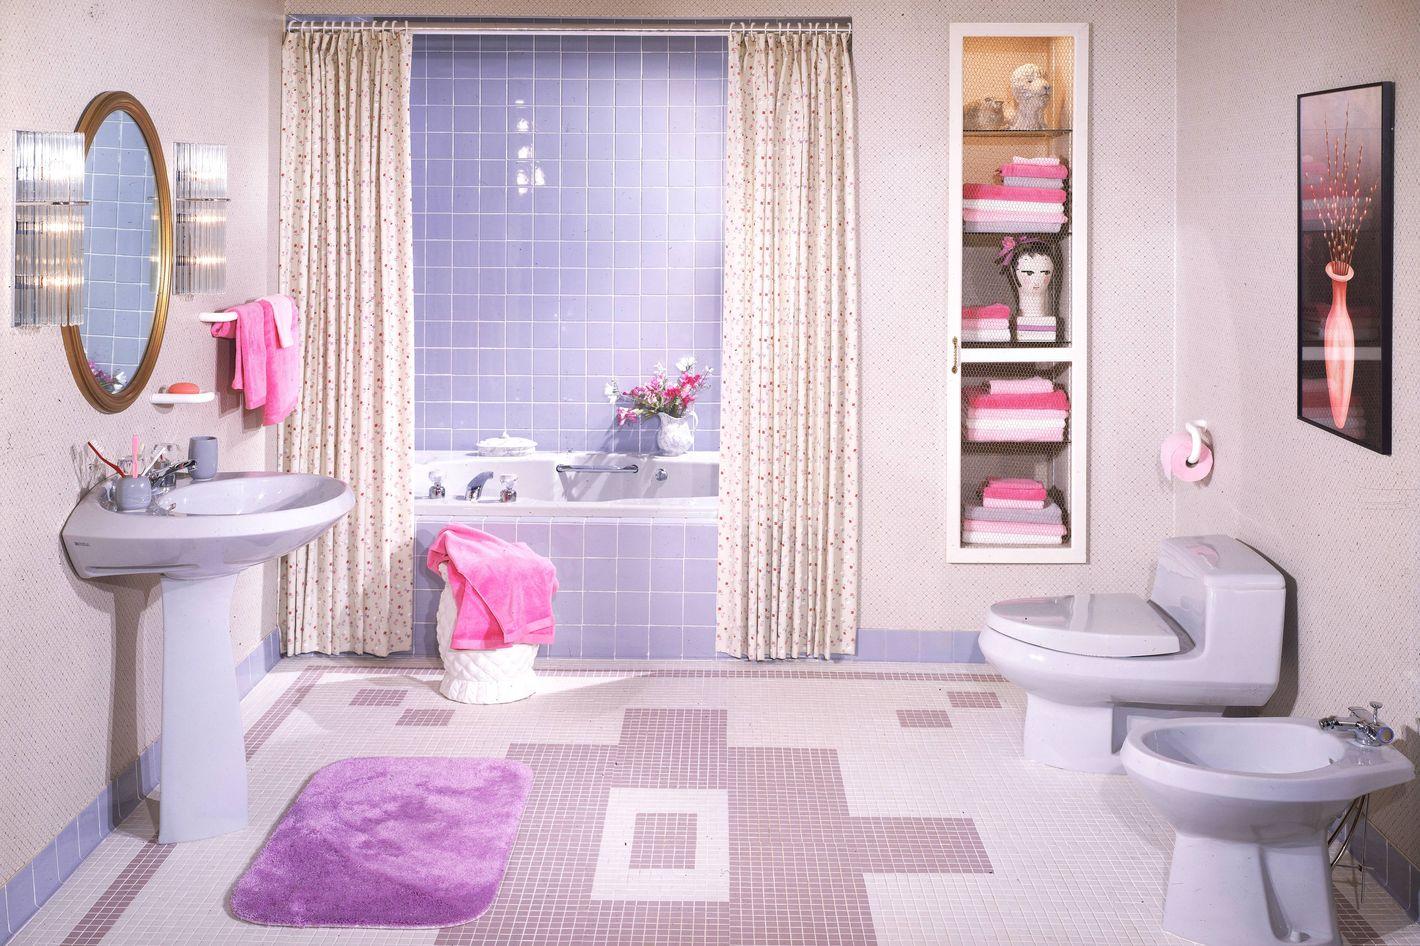 Best Bathroom Essentials Every Home Needs